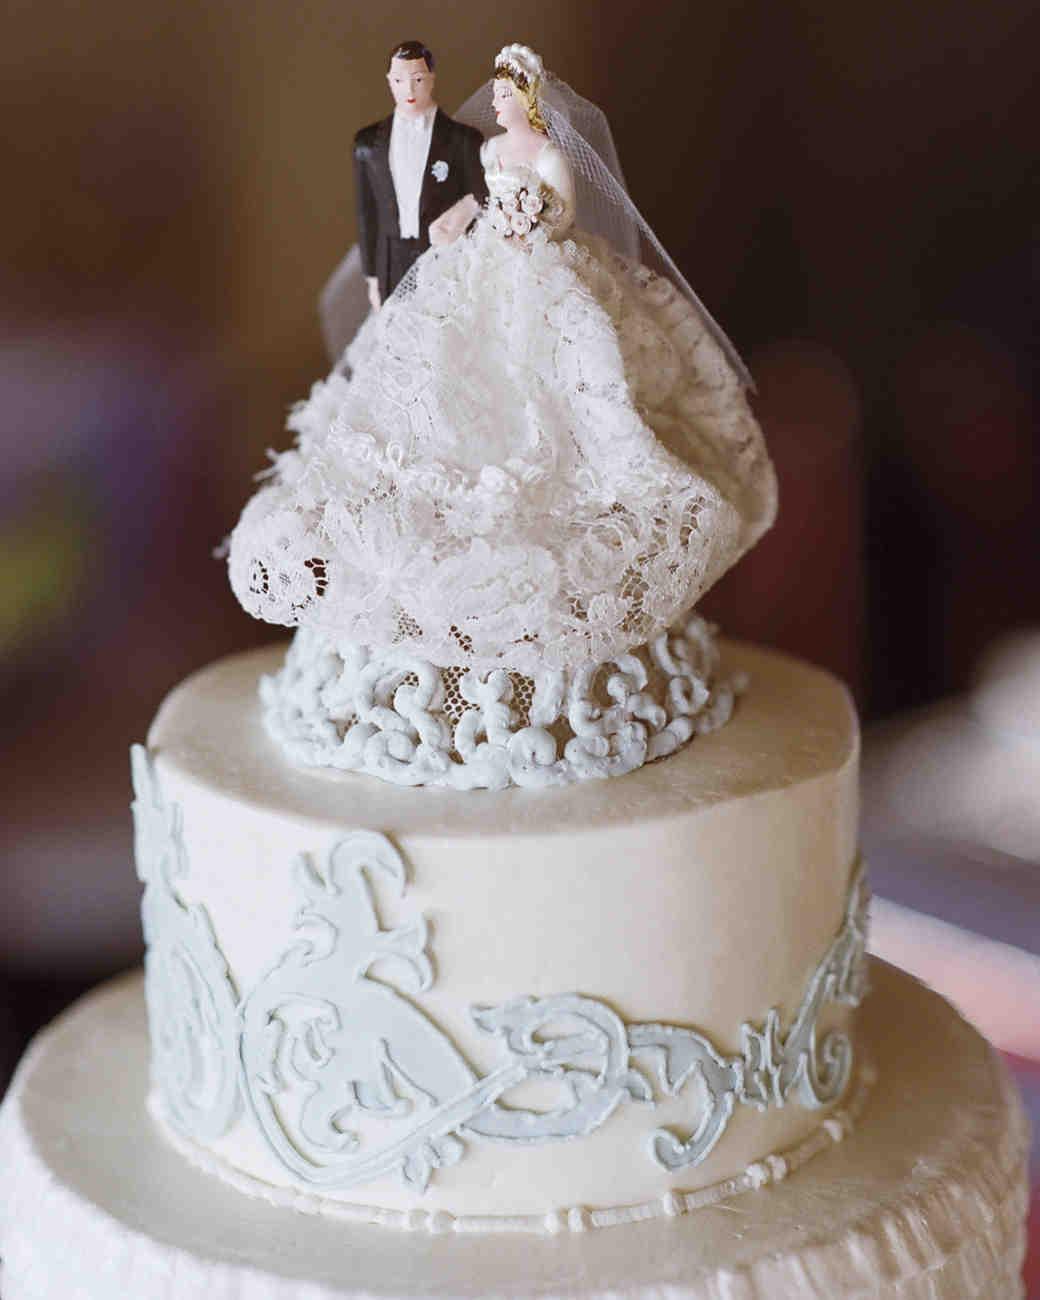 Cute Of Wedding Cake Pers Martha Stewart Weddings Wedding Cake Per Figurines Wedding Cake Pers Cats wedding cake Wedding Cake Topper